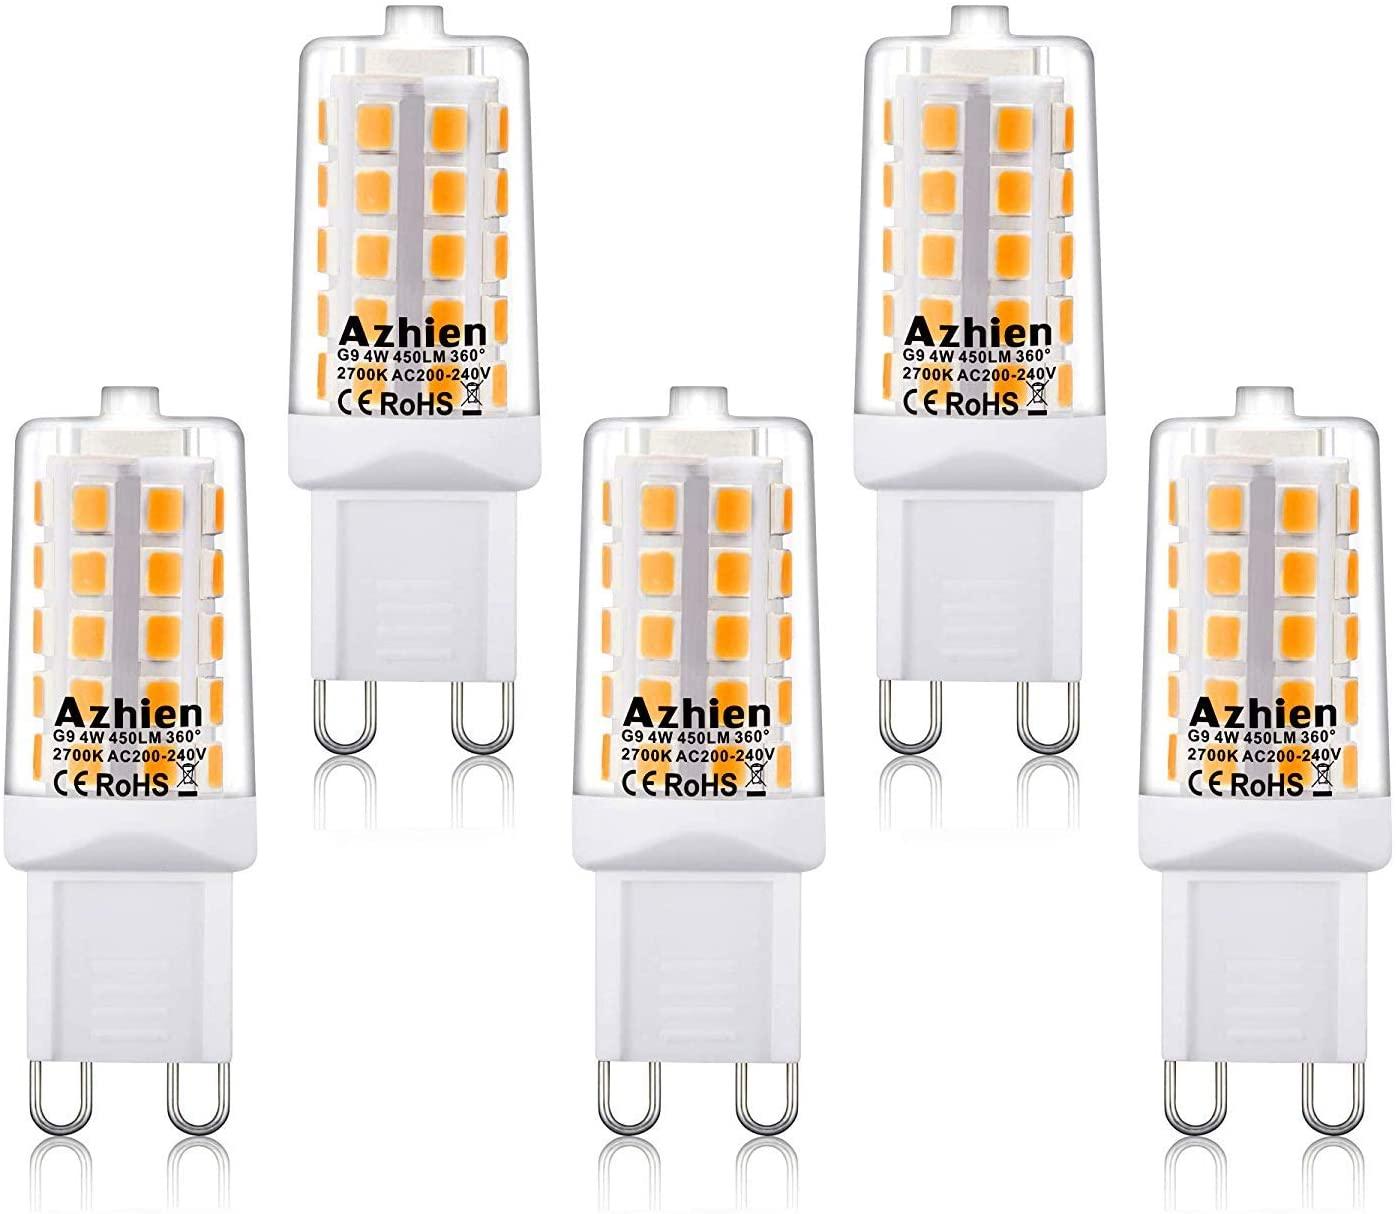 Bombillas LED G9 4W Azhien, 28W 33W 40W Equivalente de Luz Halógena, 2700K Lámparas LED Blancas Cálidas, 200-240V AC, Sin parpadeo, Sin Estroboscópico, 360 Grados, 450Lm, Paquete de 5 [Clase de eficiencia energética A++]